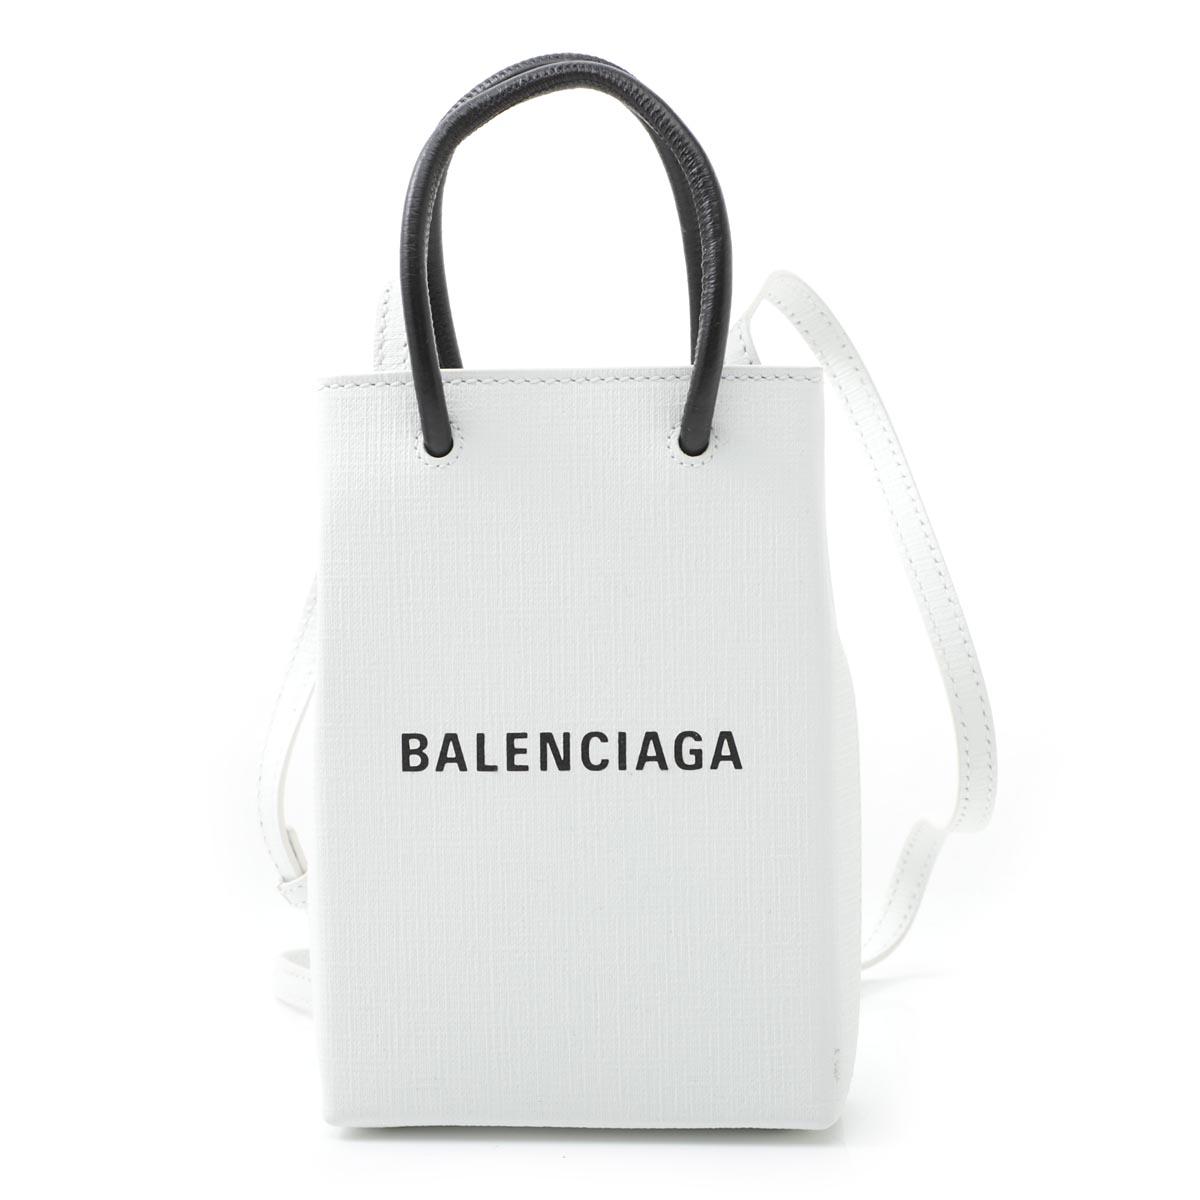 <title>送料無料 バレンシアガ メーカー公式ショップ BALENCIAGA フォンホルダー SHOPPING ショッピング ホワイト レディース 593826 0ai2n 9000 あす楽対応_関東 返品送料無料 ラッピング無料</title>